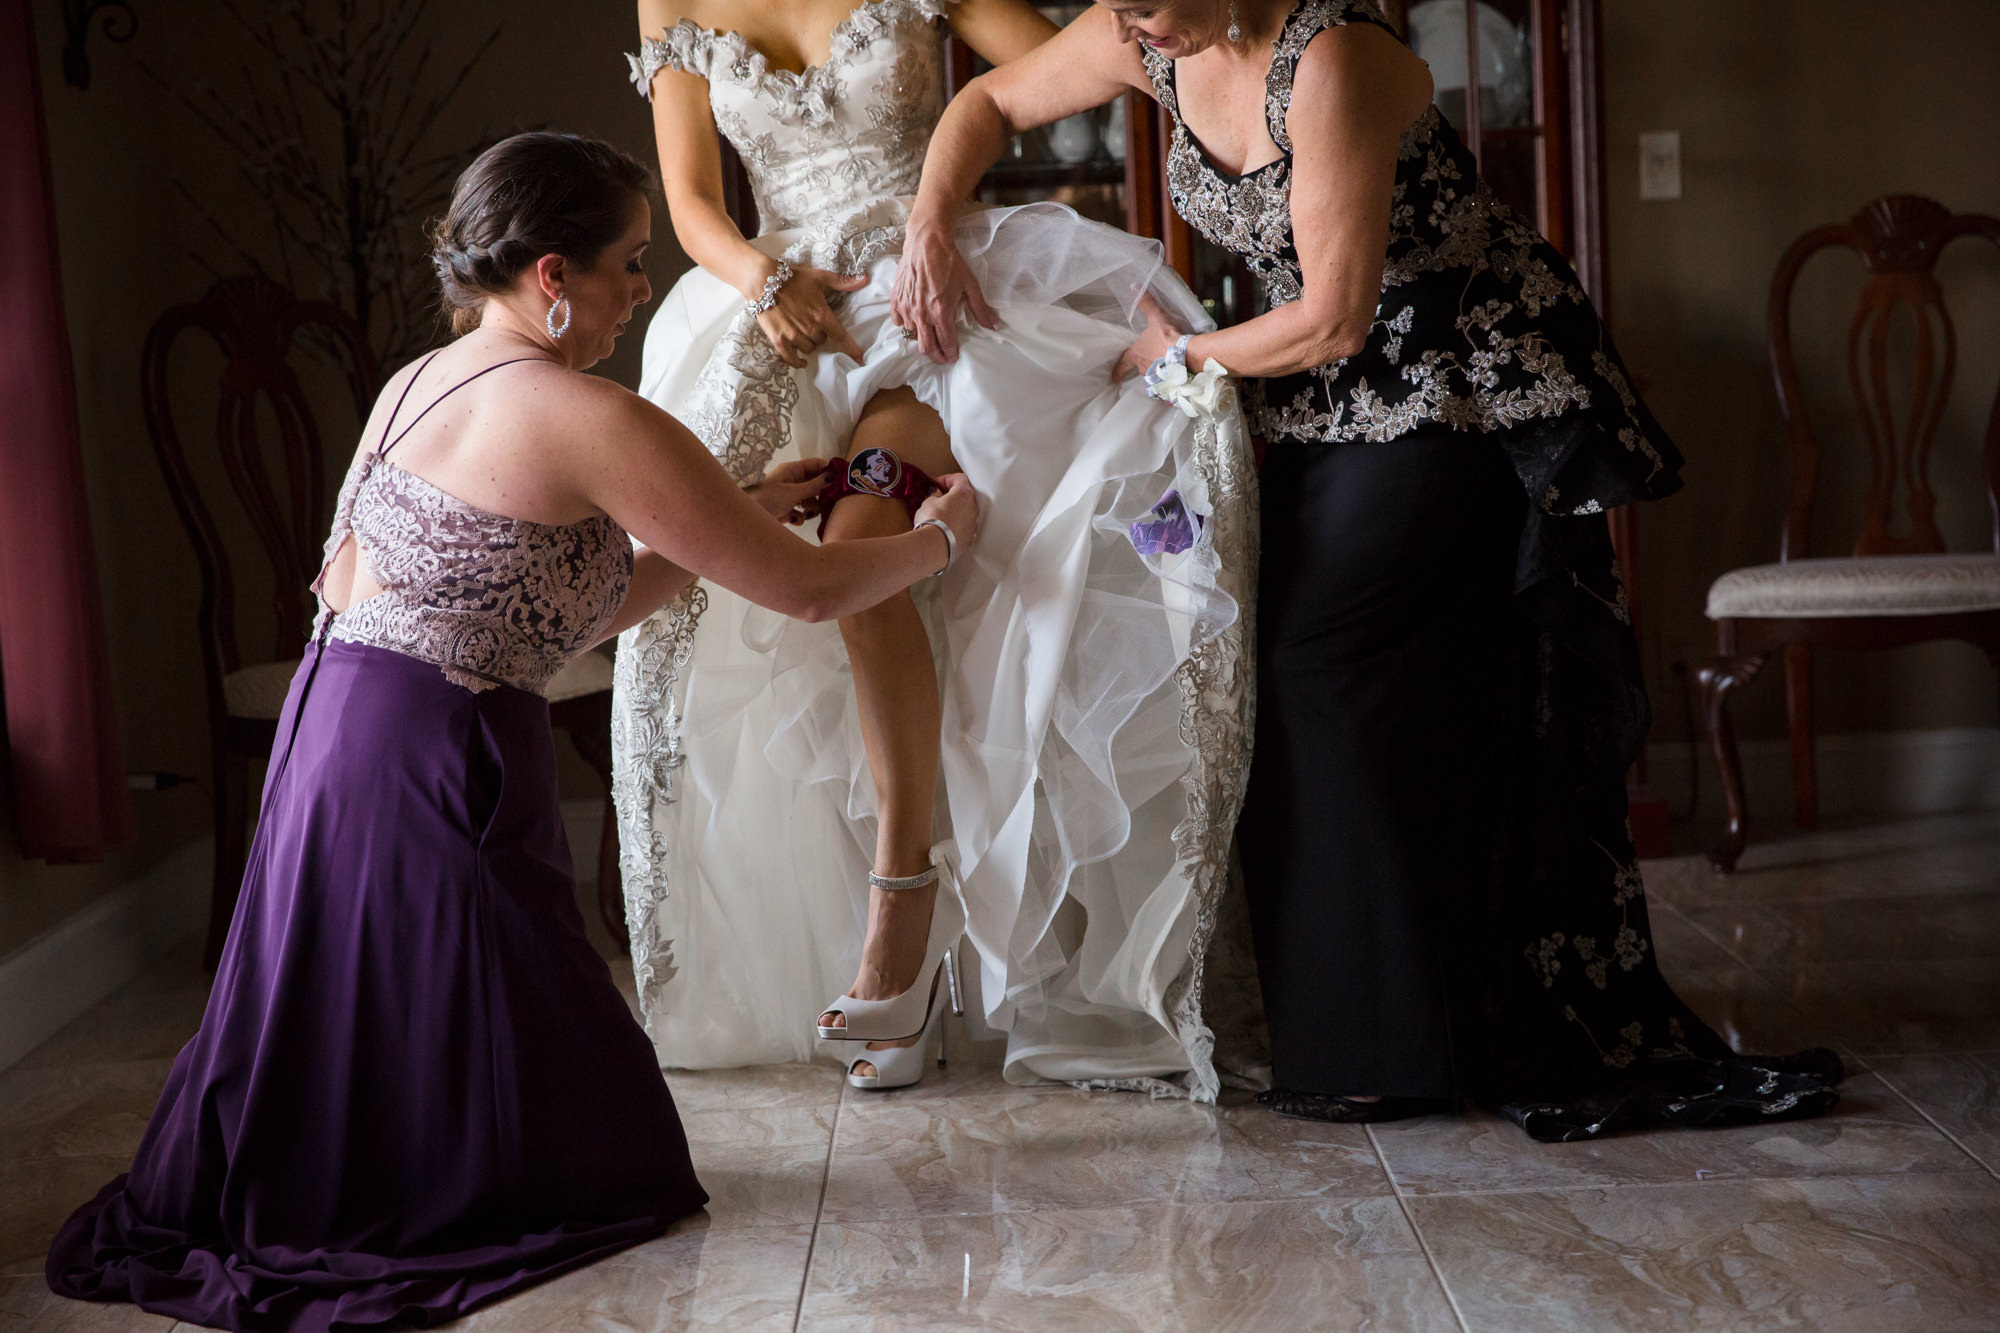 Benvenuto_Wedding_catholic_Florida_Bride-Groom-20.jpg